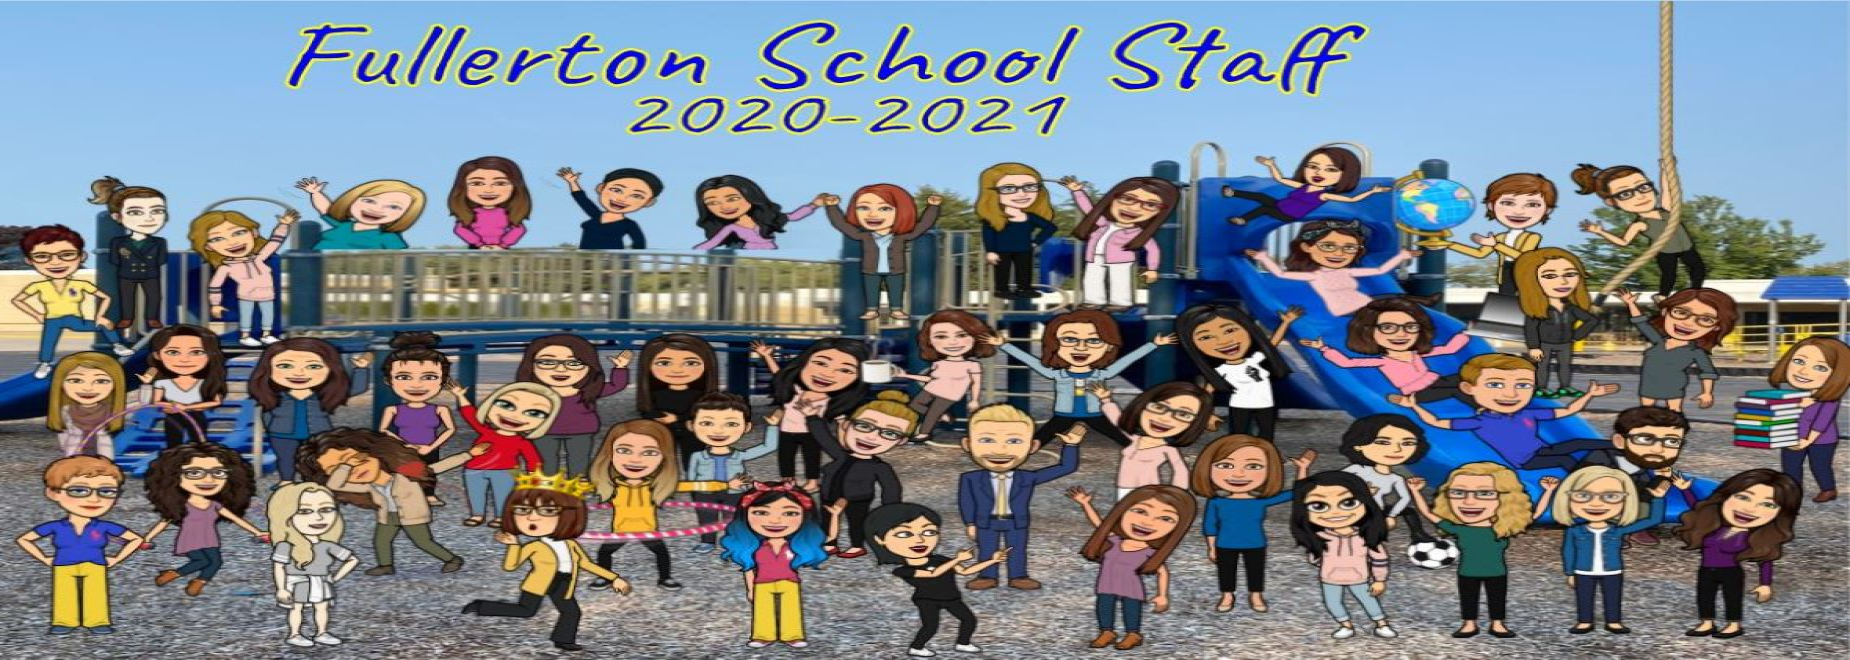 Fullerton School Staff 20-21